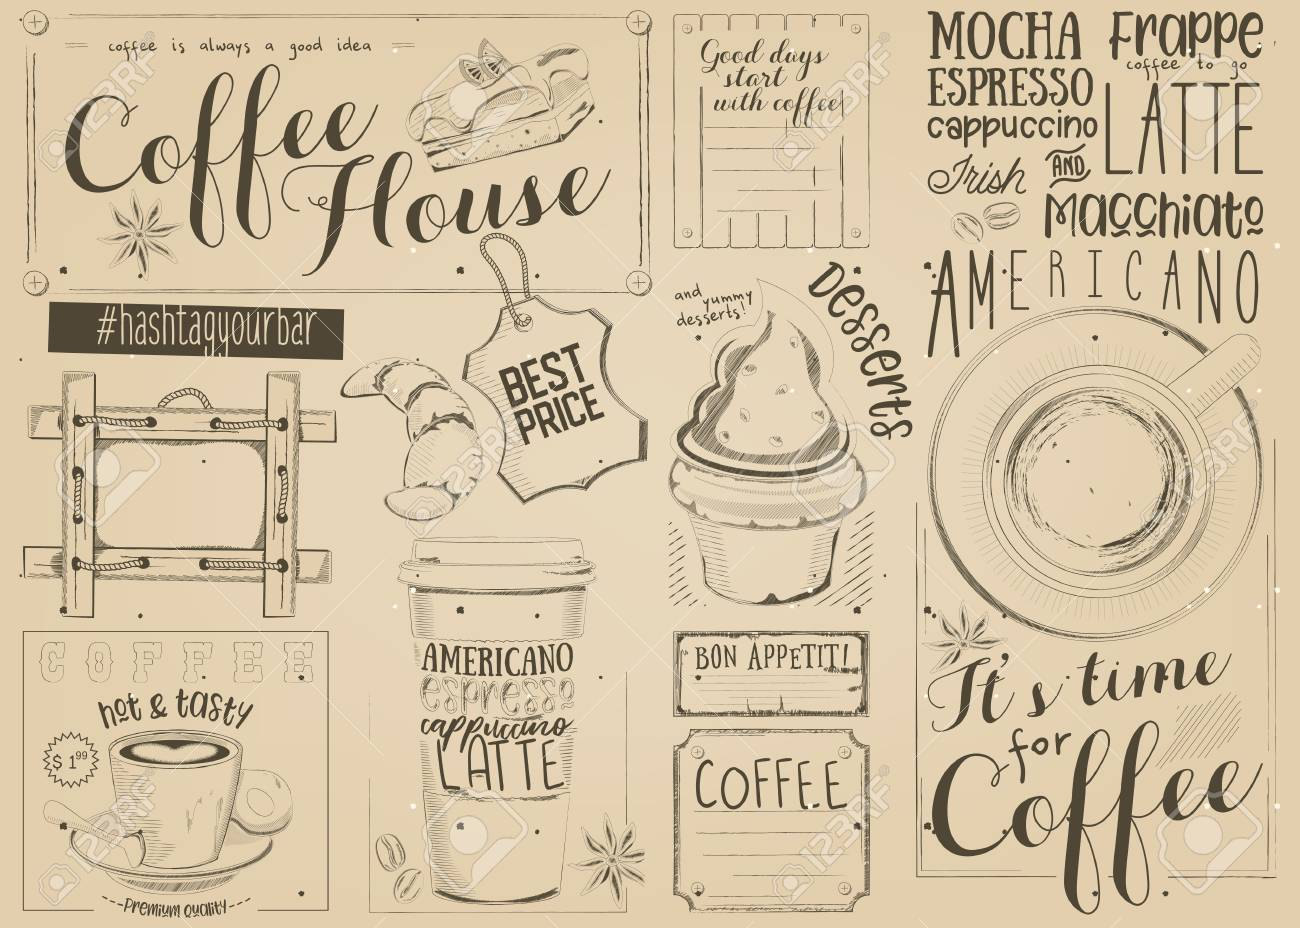 coffee menu placemat design